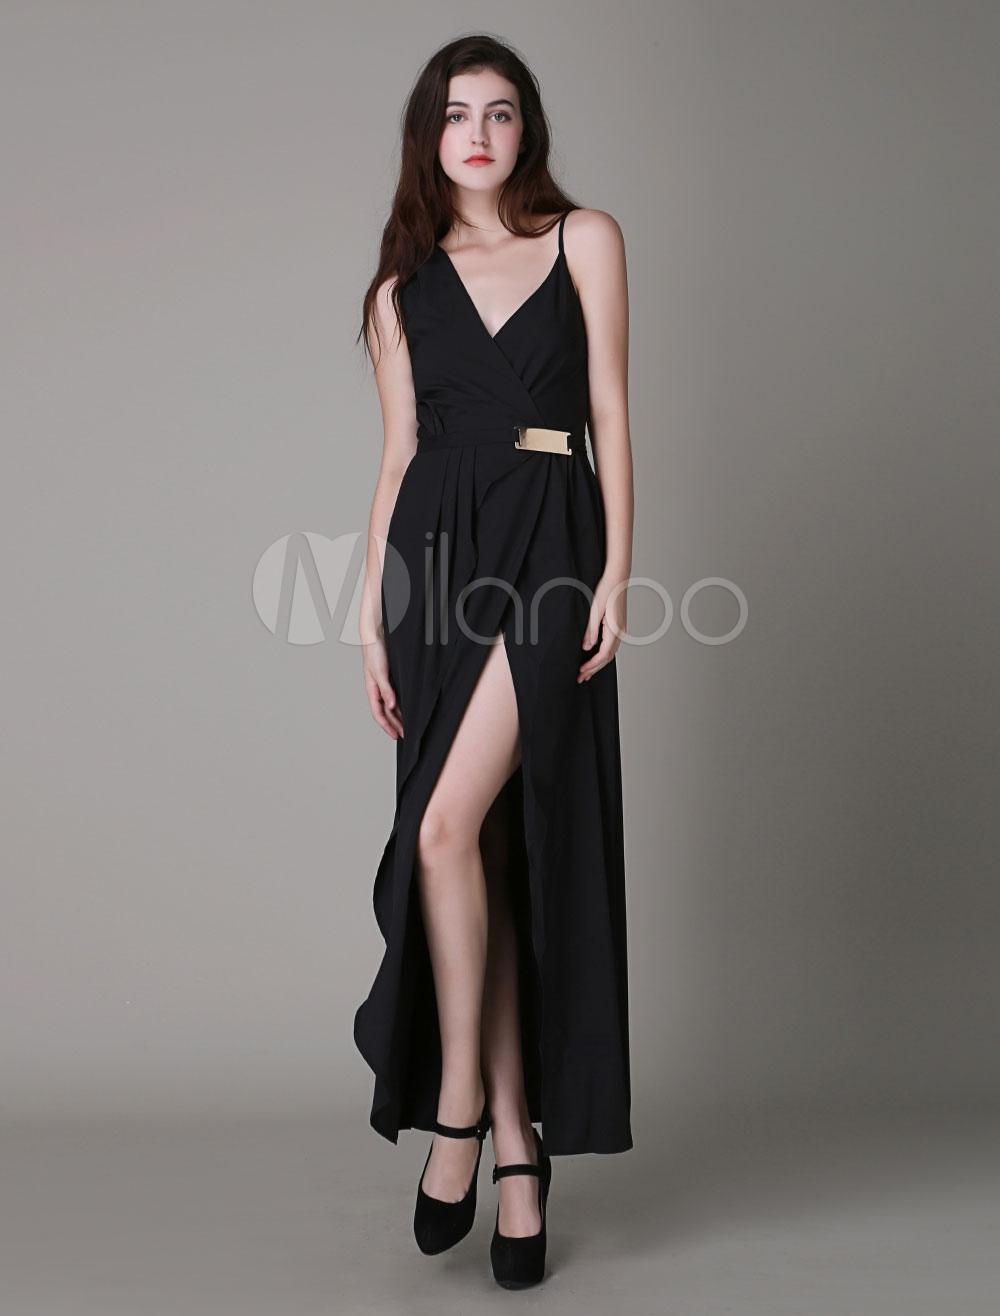 73a00e62ef623 Negro Vestido largo tirantes faja sin mangas - Milanoo.com